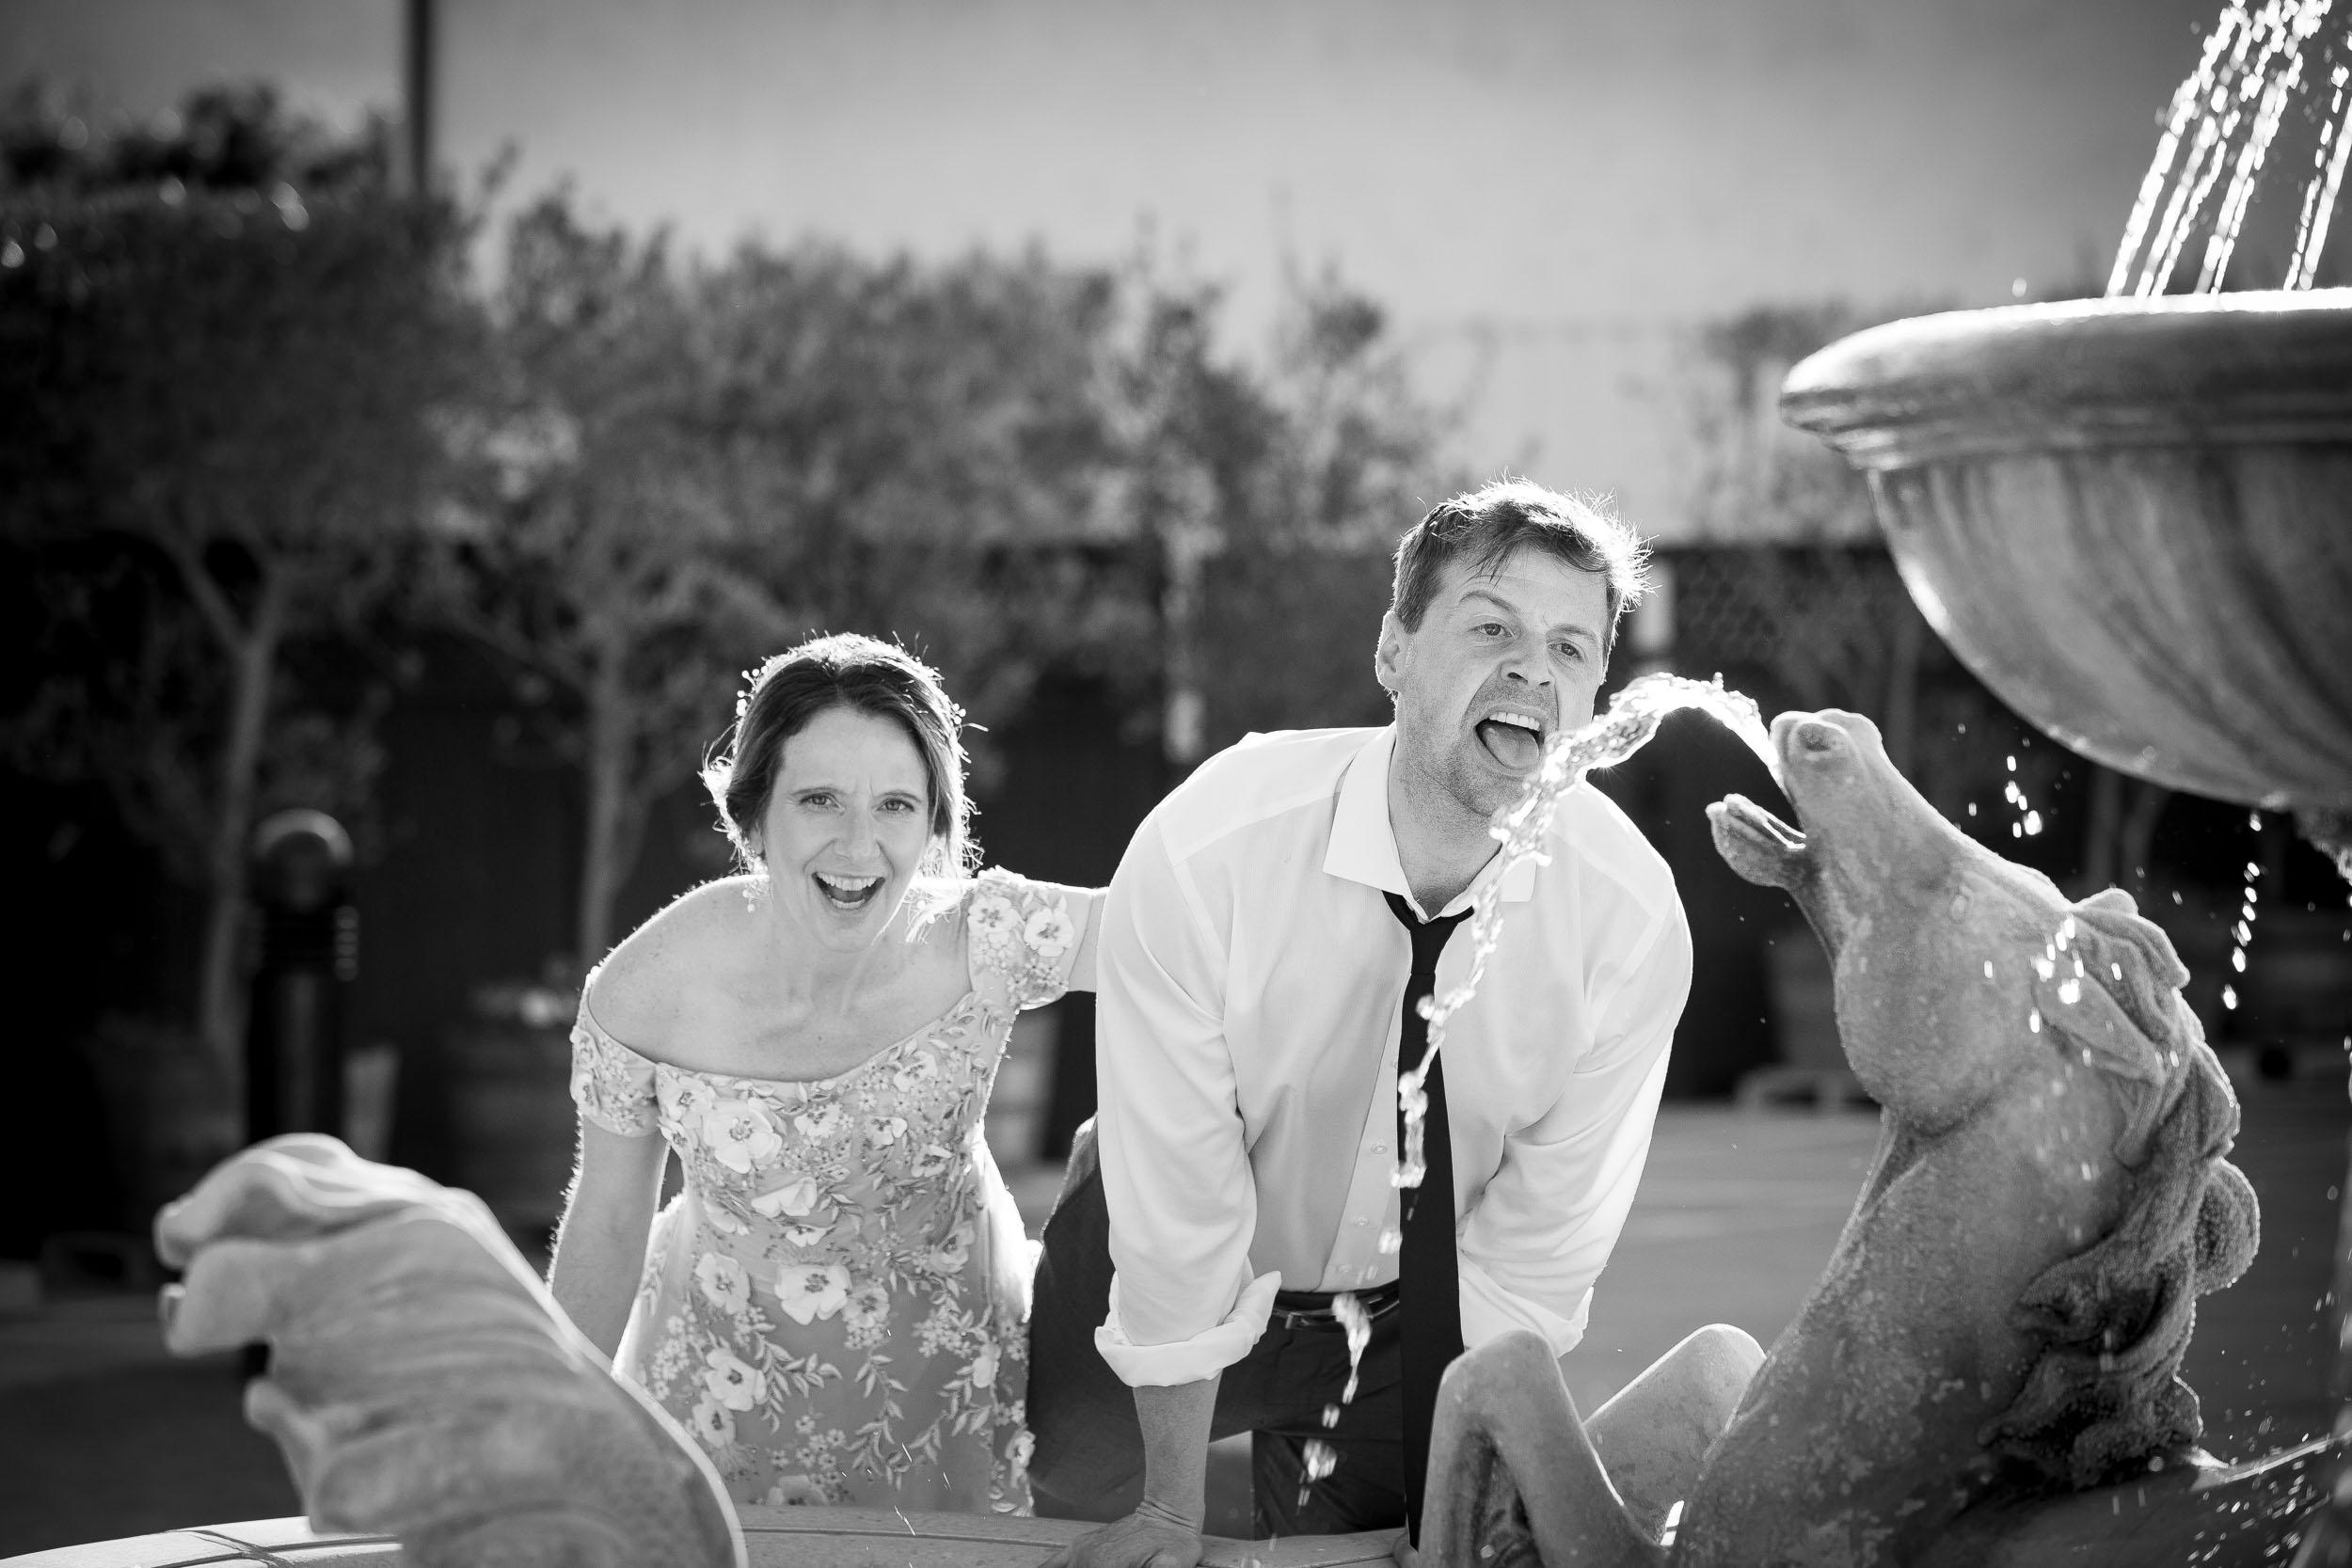 Jacuzzi Family Vineyards Wedding Photos-29.jpg